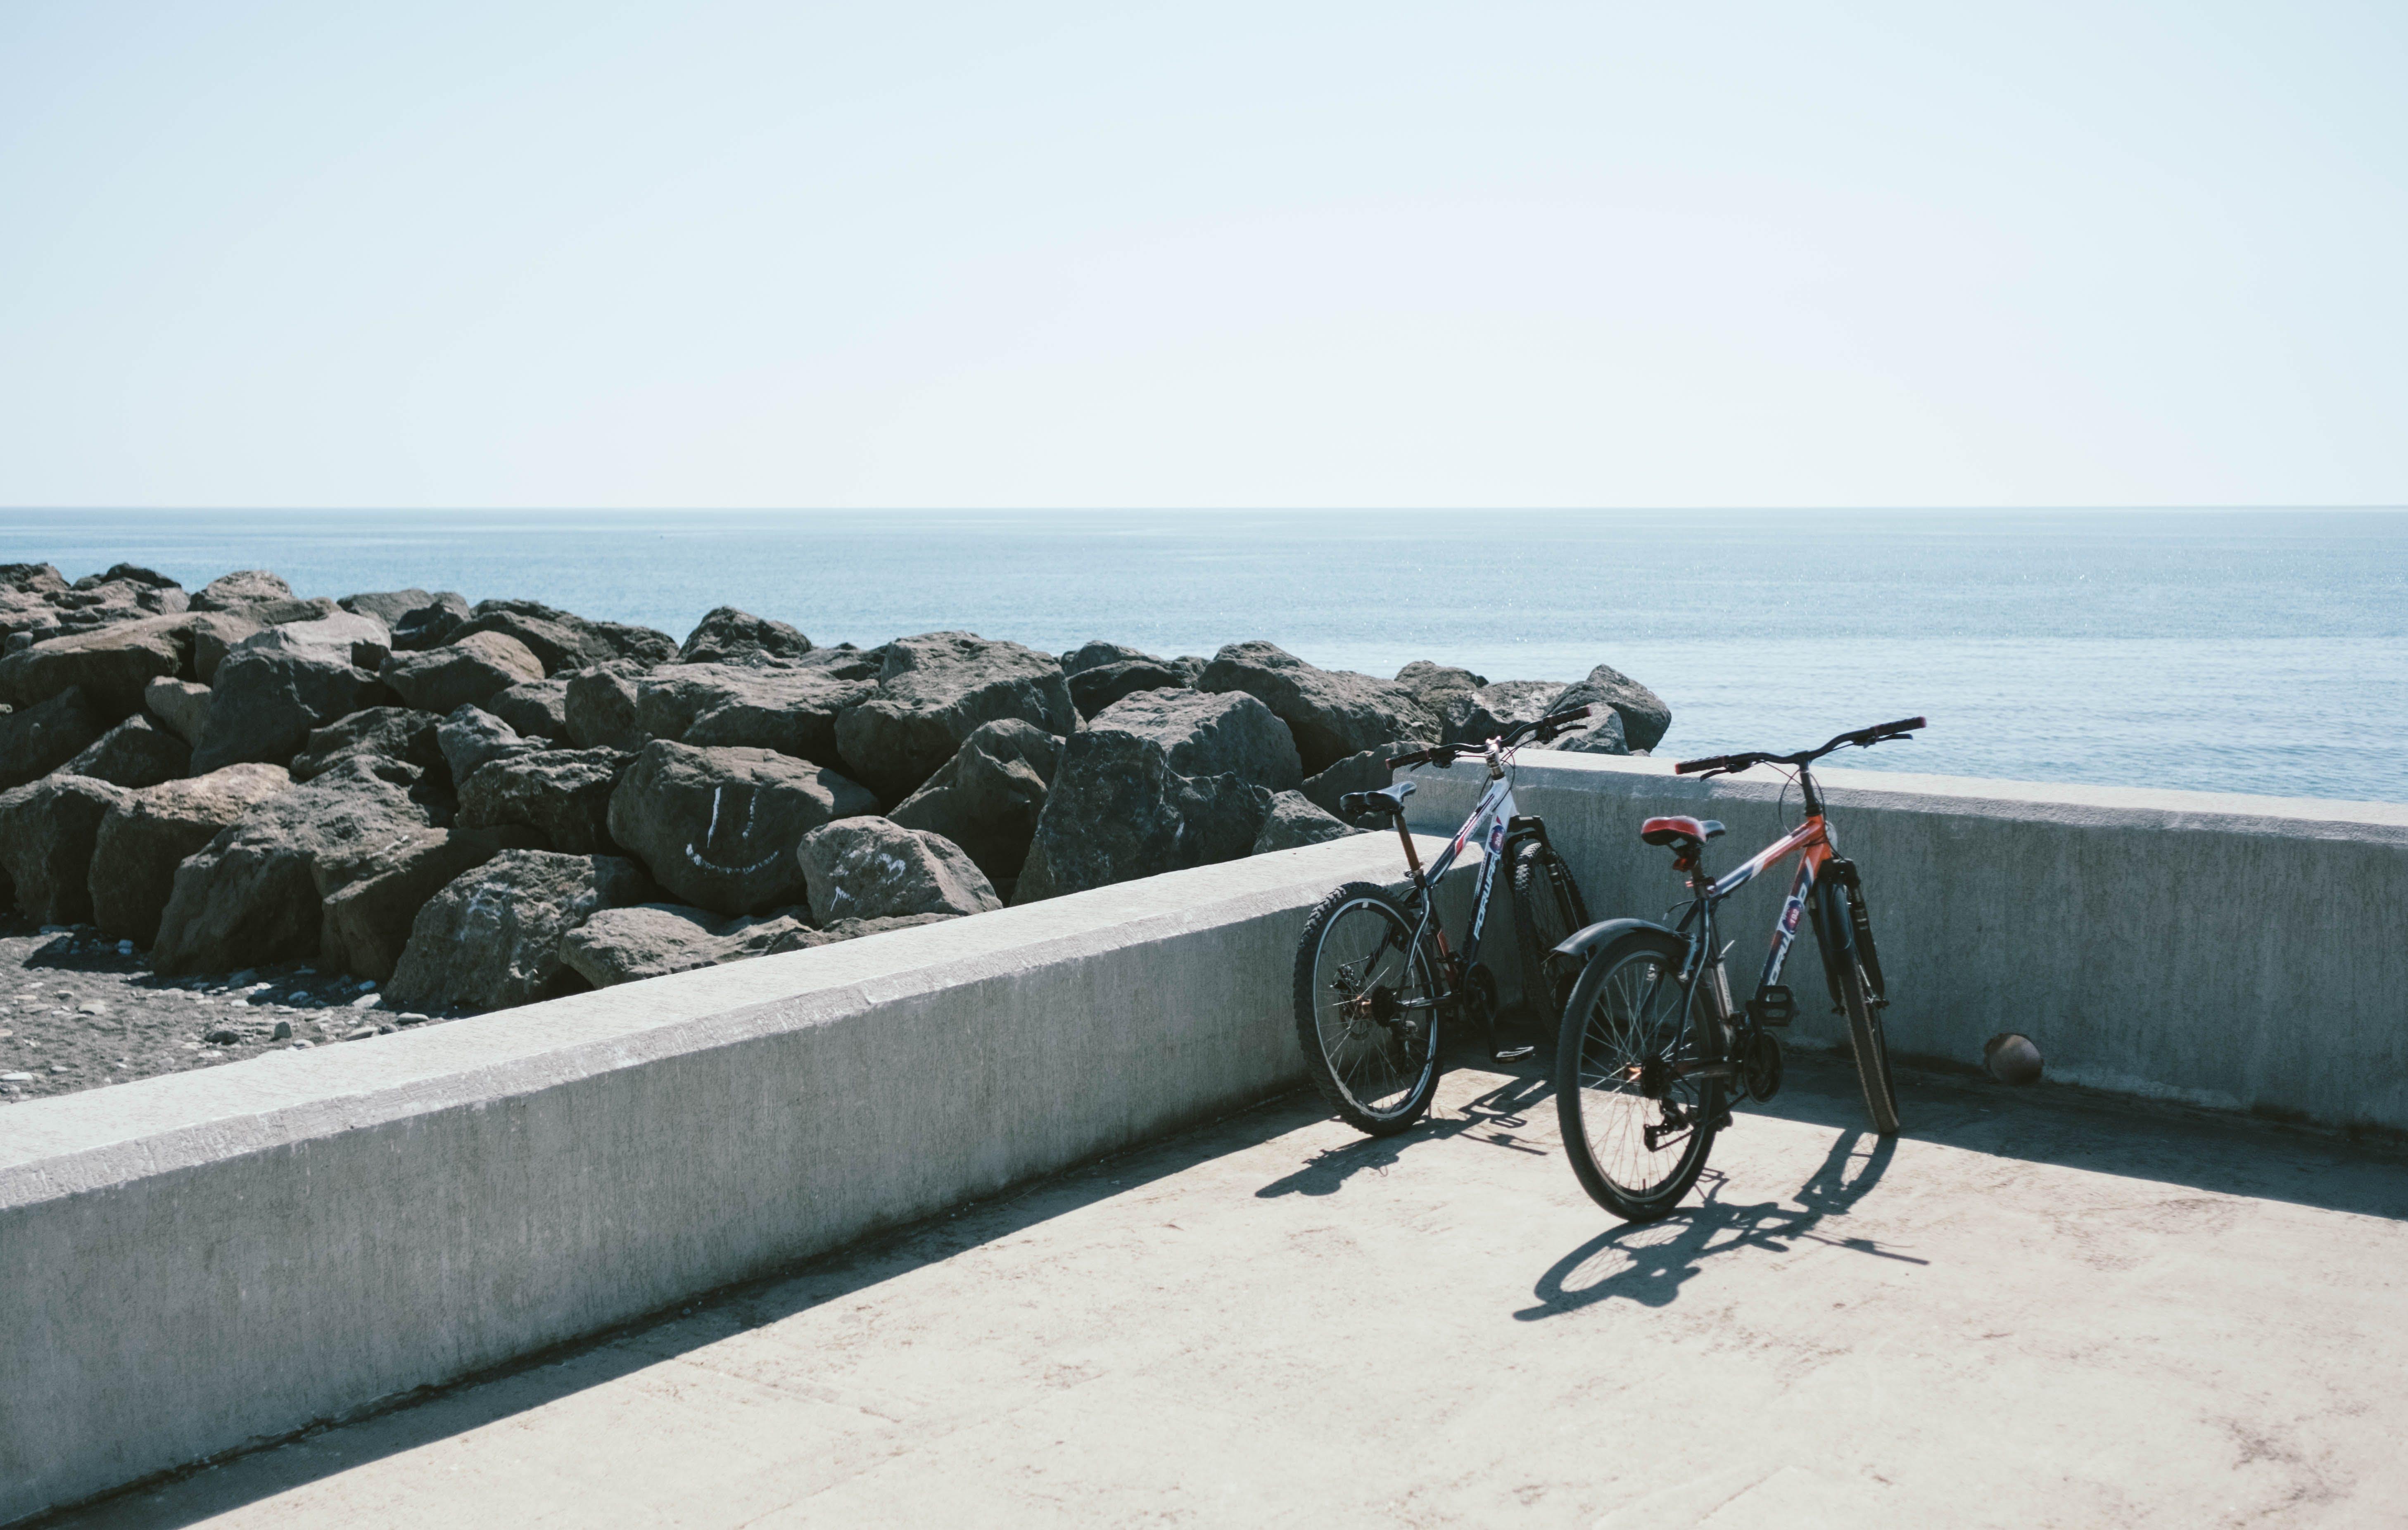 Gratis lagerfoto af barriere, beton, betongulv, cykel